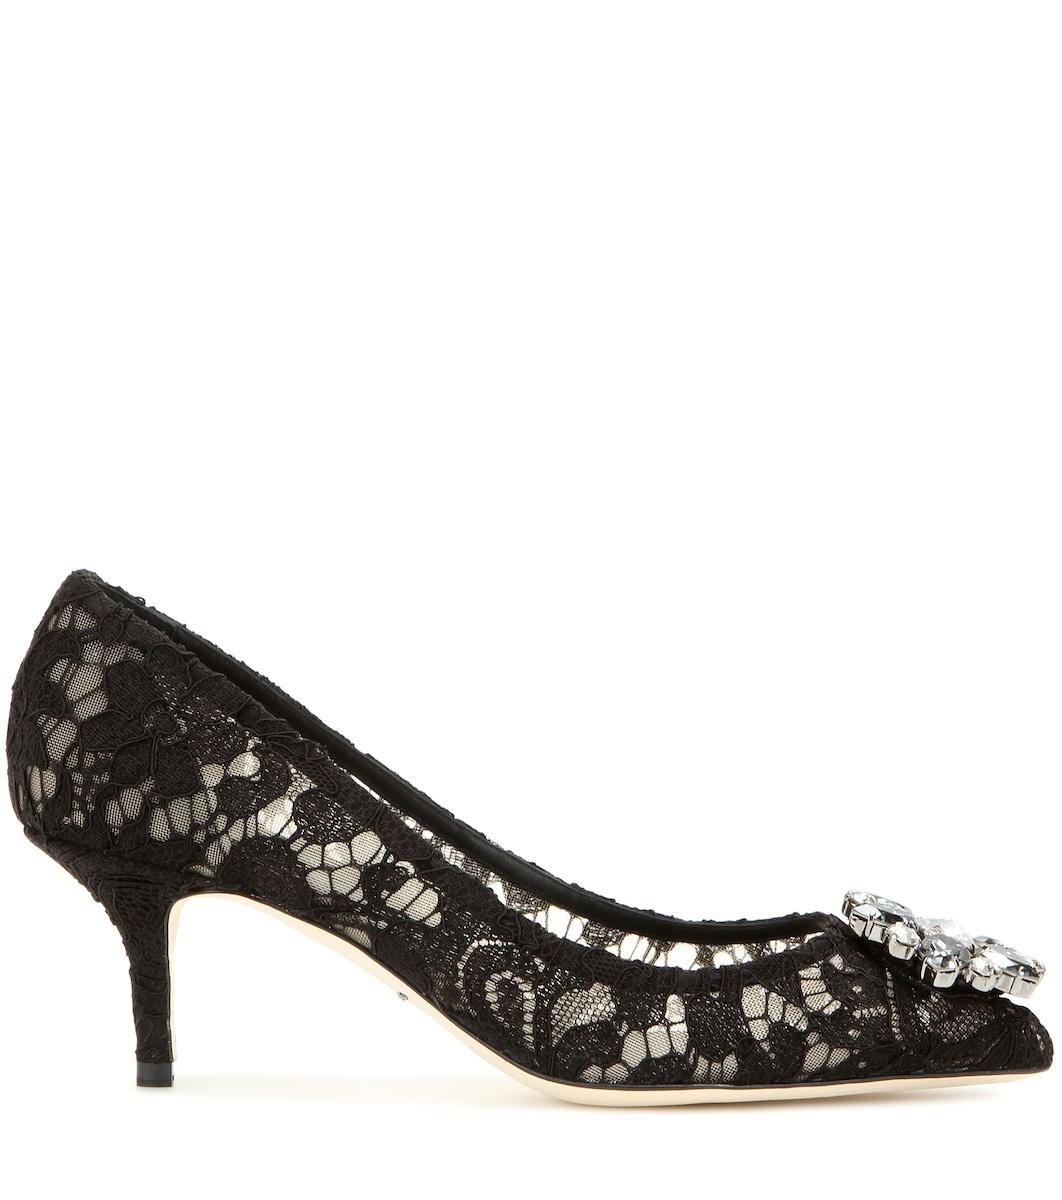 f0ea56622 حذاء من الدانتيل مع تزيين بالكريستال Bellucci - Dolce & Gabbana | mytheresa